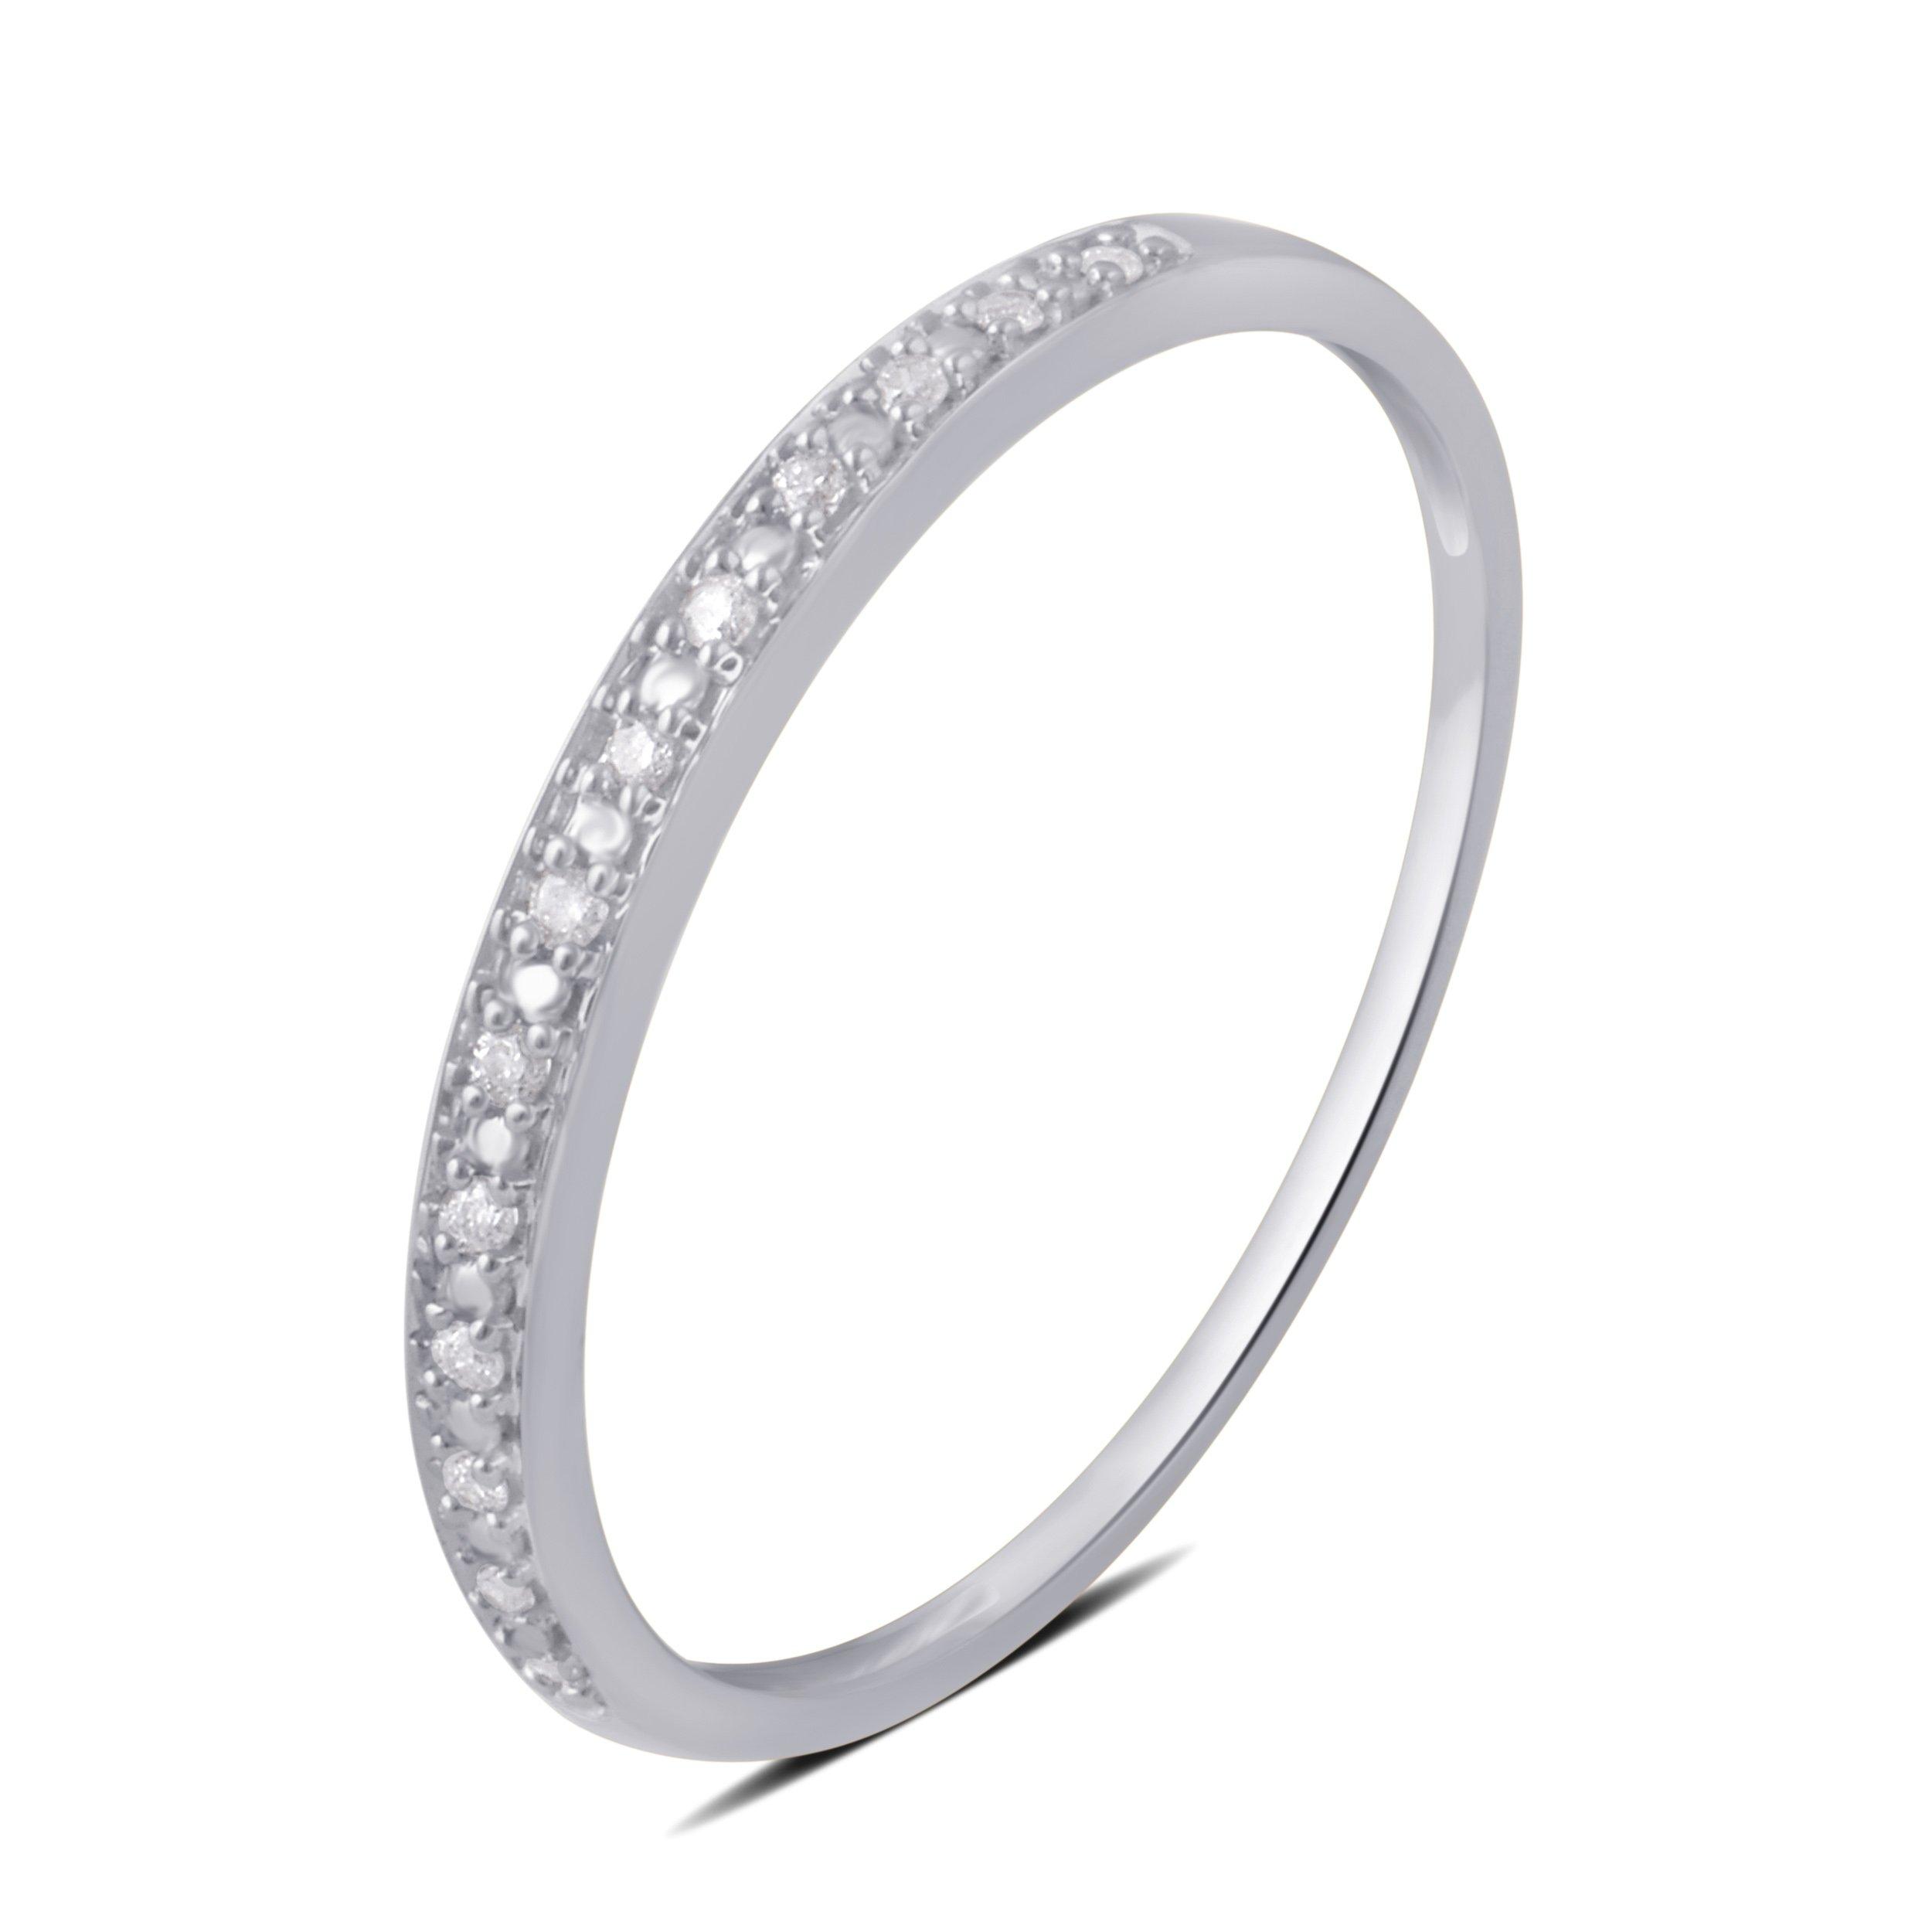 0.05 CTTW Round Diamond Wedding Band in 10K White Gold